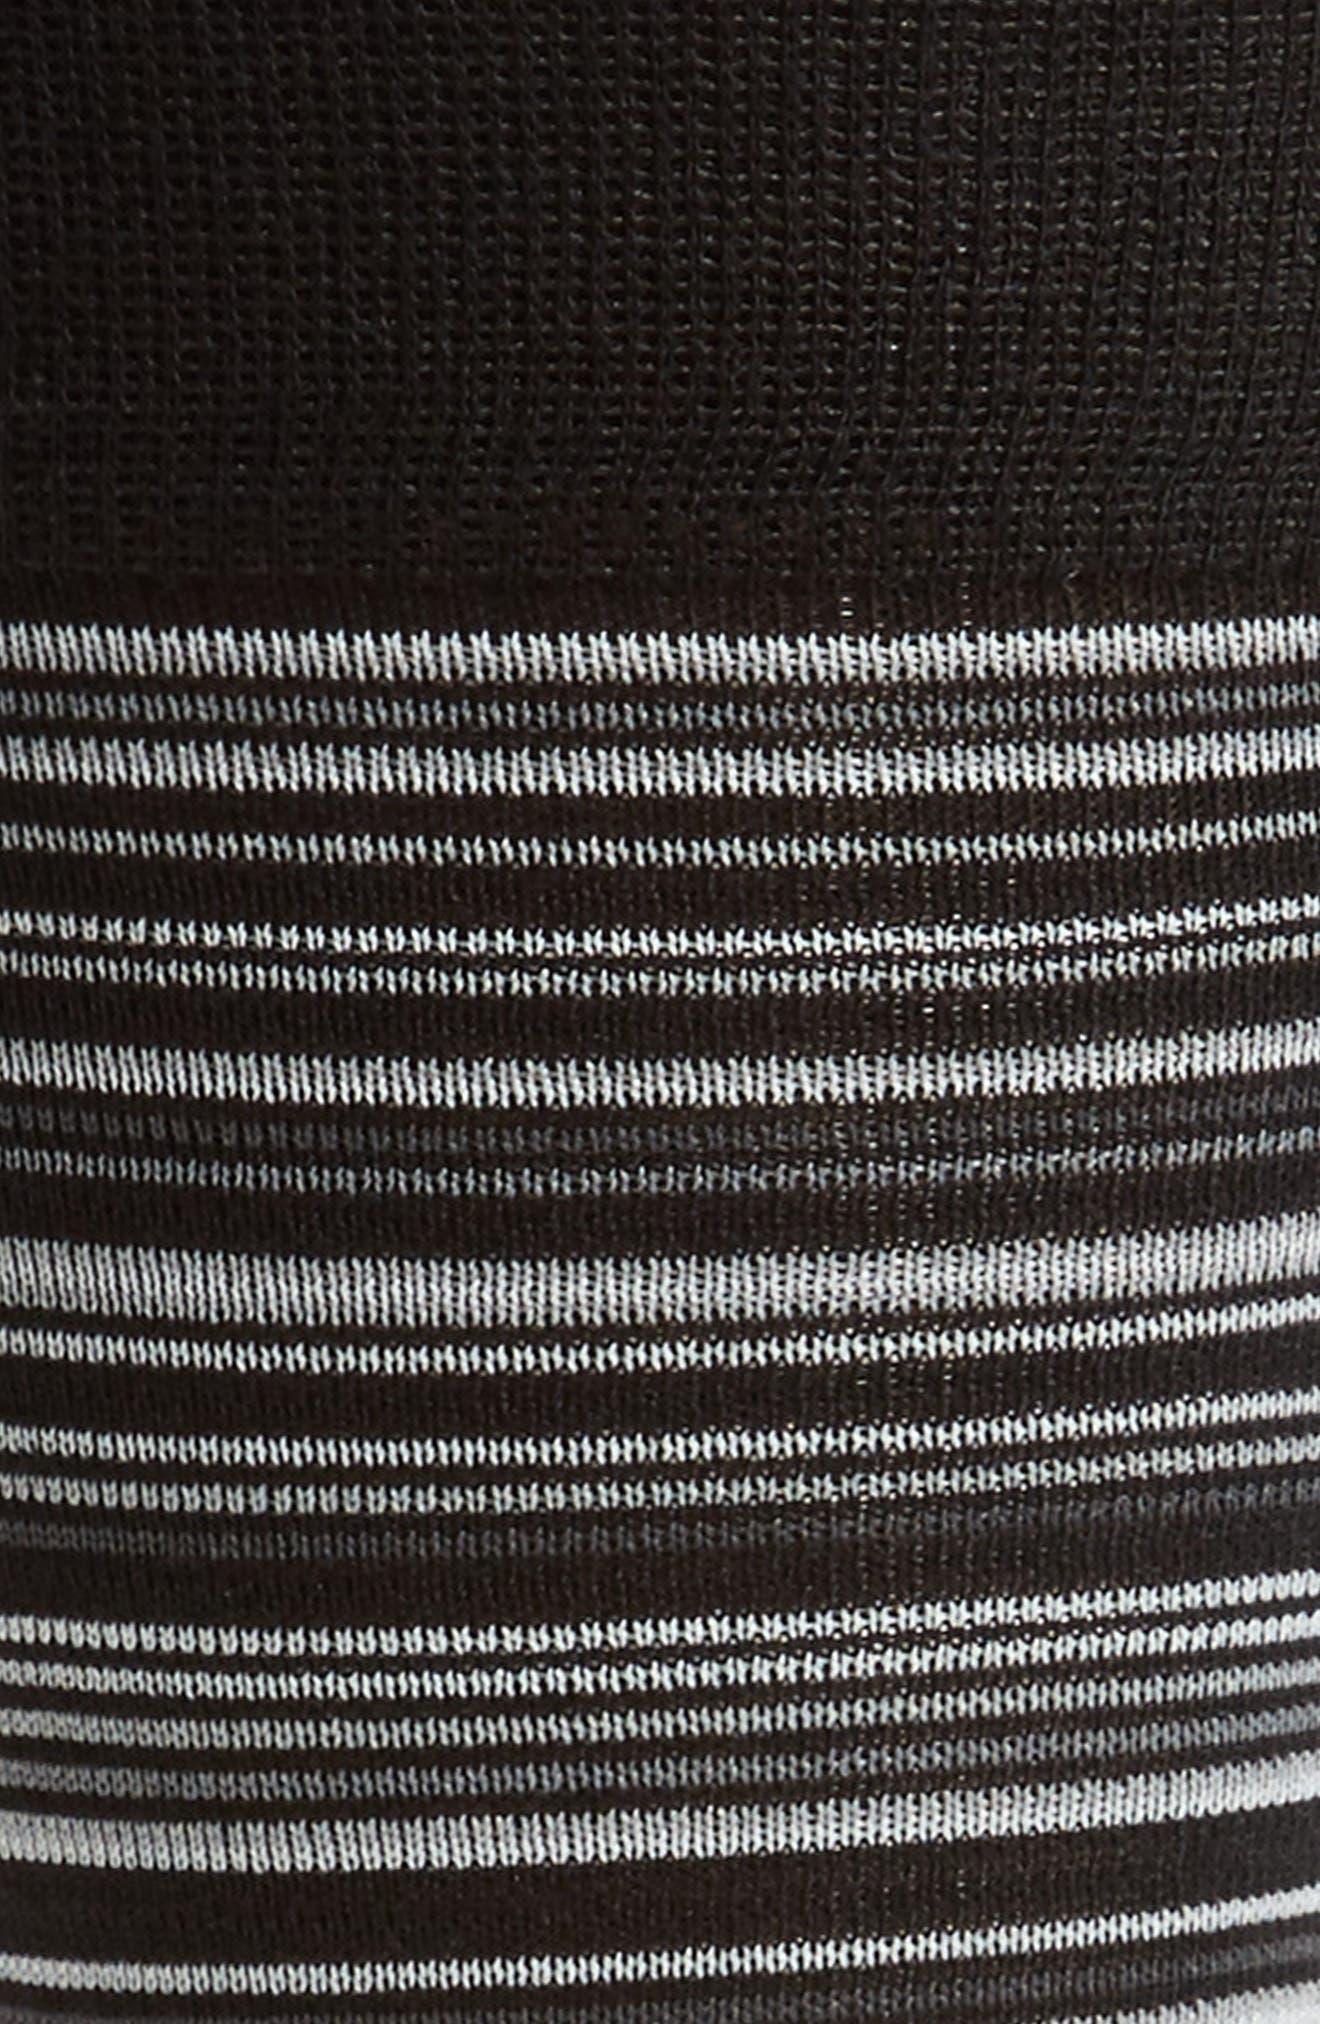 Multistripe Crew Socks,                             Alternate thumbnail 2, color,                             BLACK/ GREY